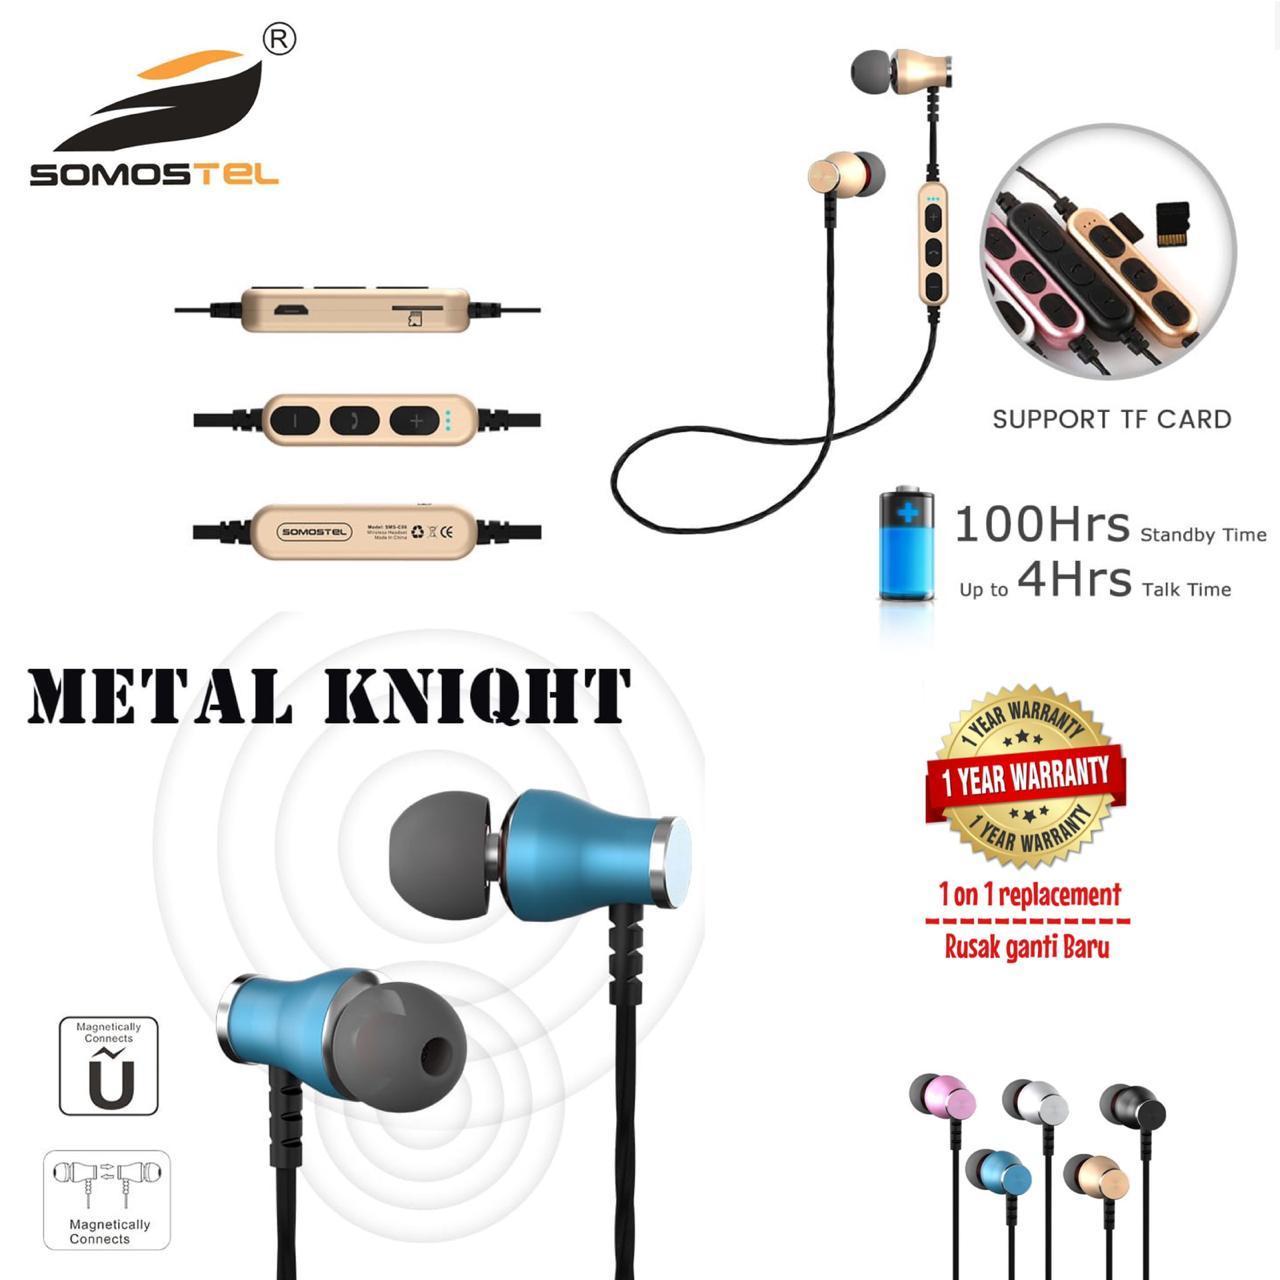 Somostel wireless earphone / headset bluetooth metal knigth , sms-ck01, garansi resmi 1